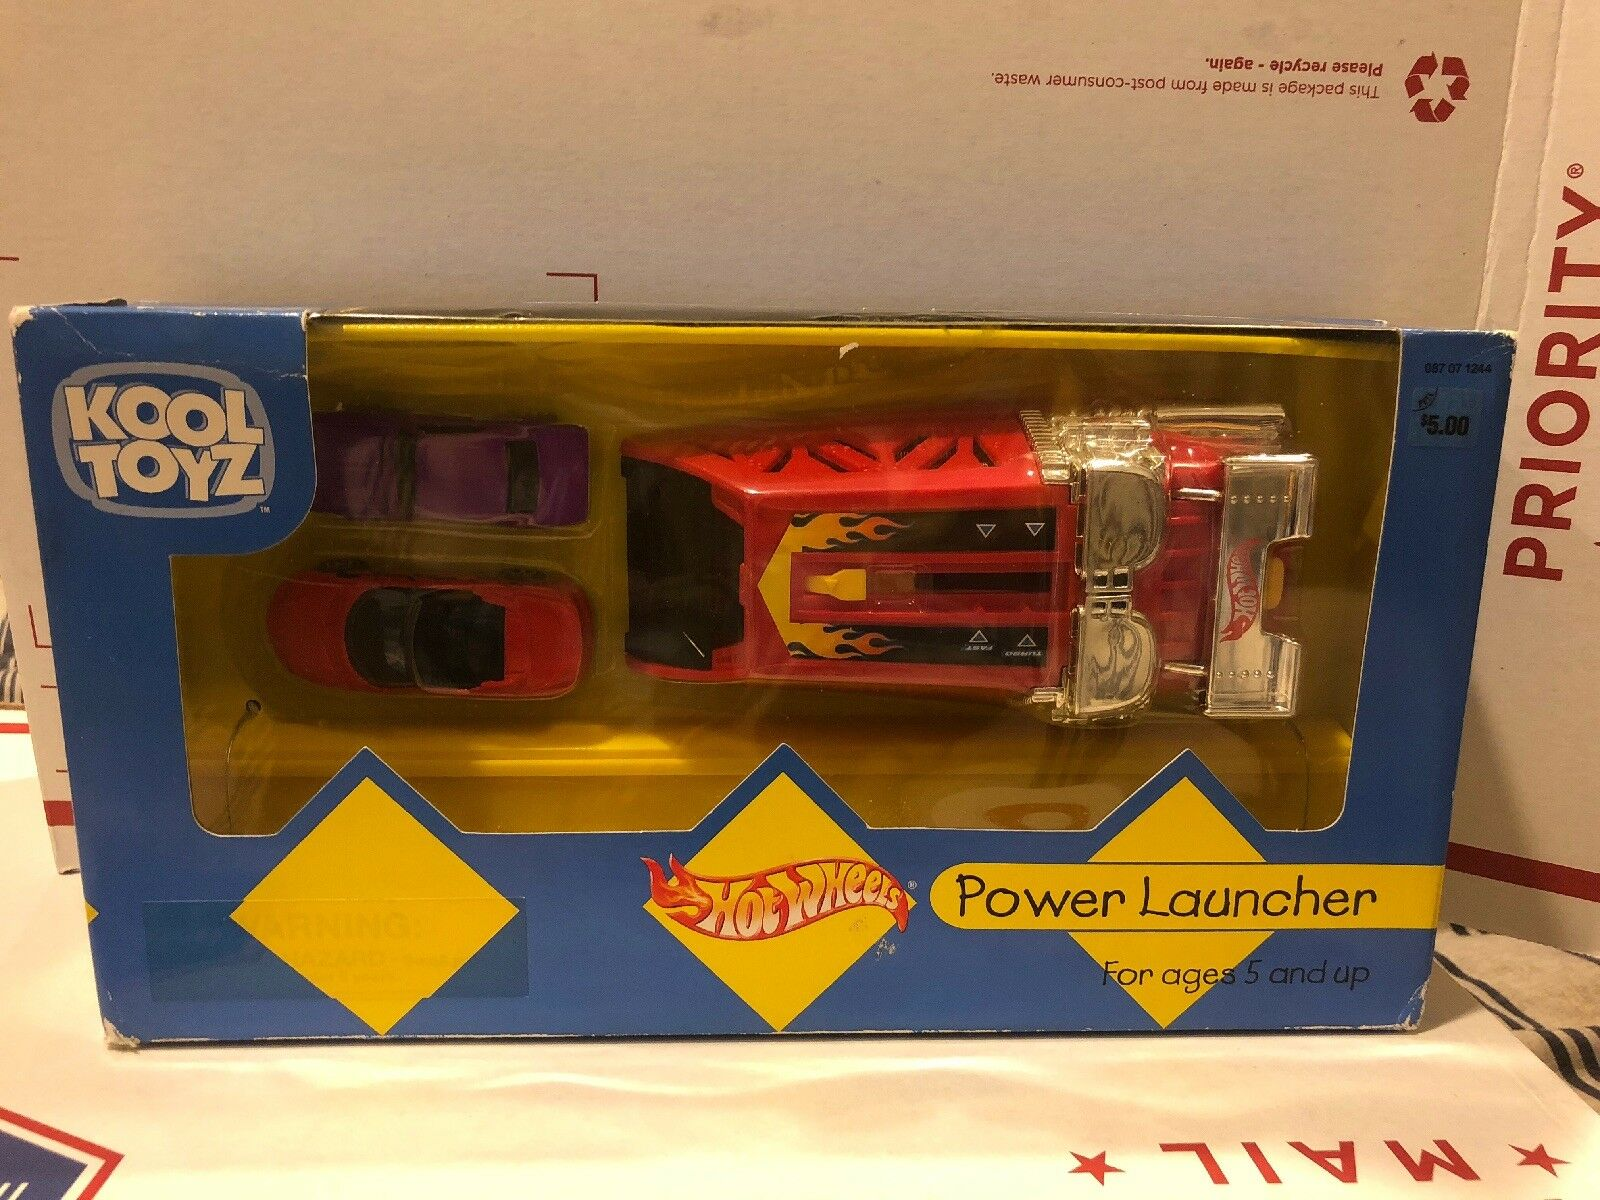 Kool Toyz Target Hot Wheels Power Launcher 67 Camaro Purple Rare